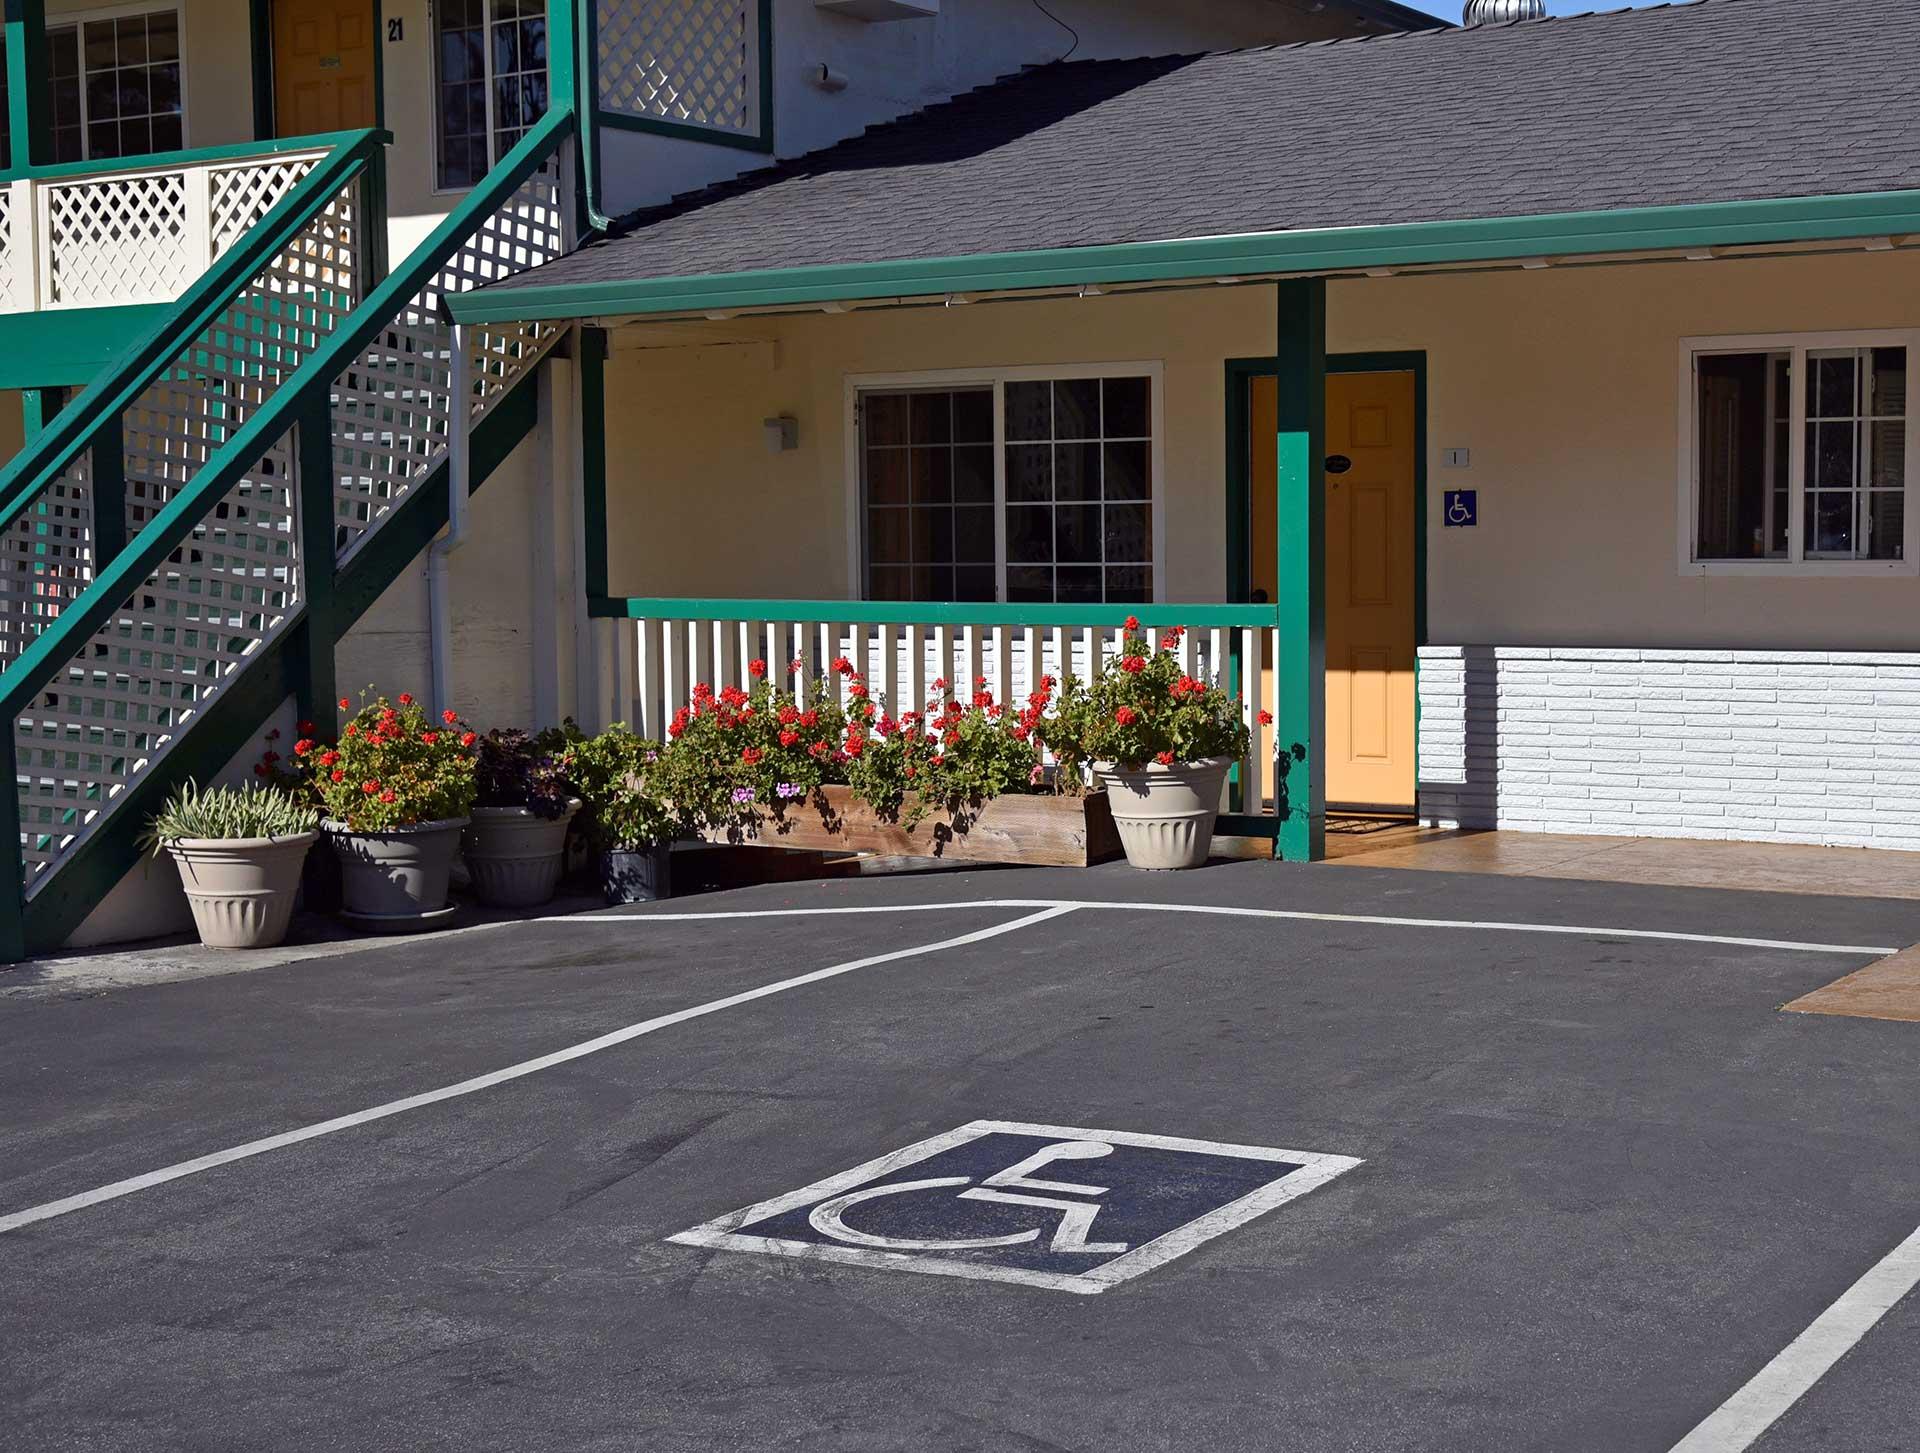 Monterey Pines Inn ADA Parking Stall